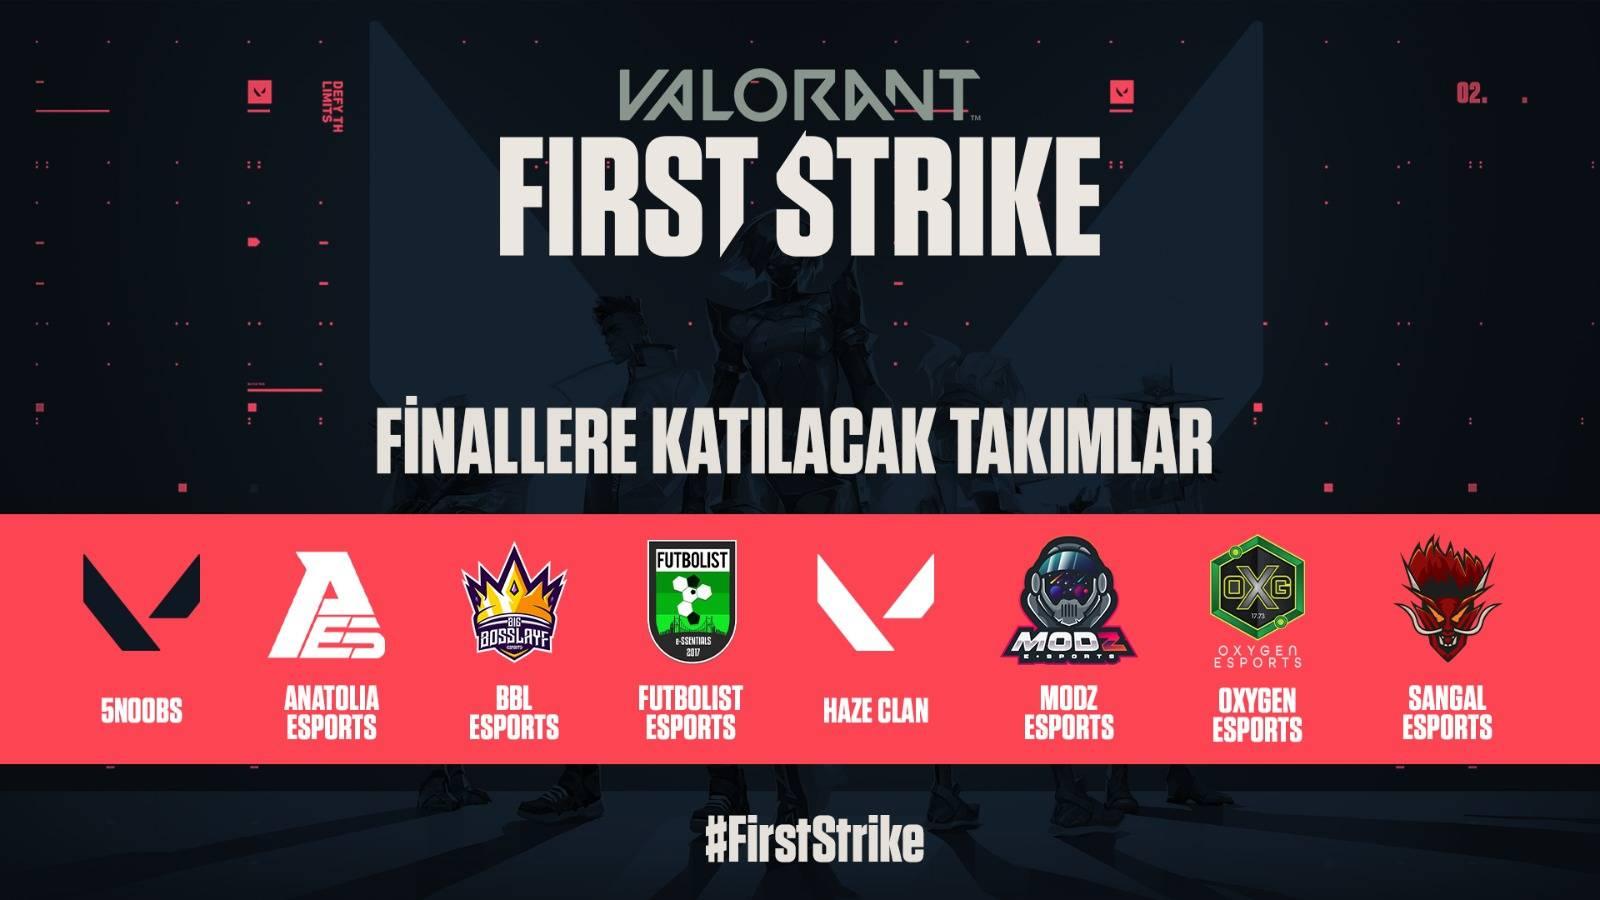 Valorant-First-Strike